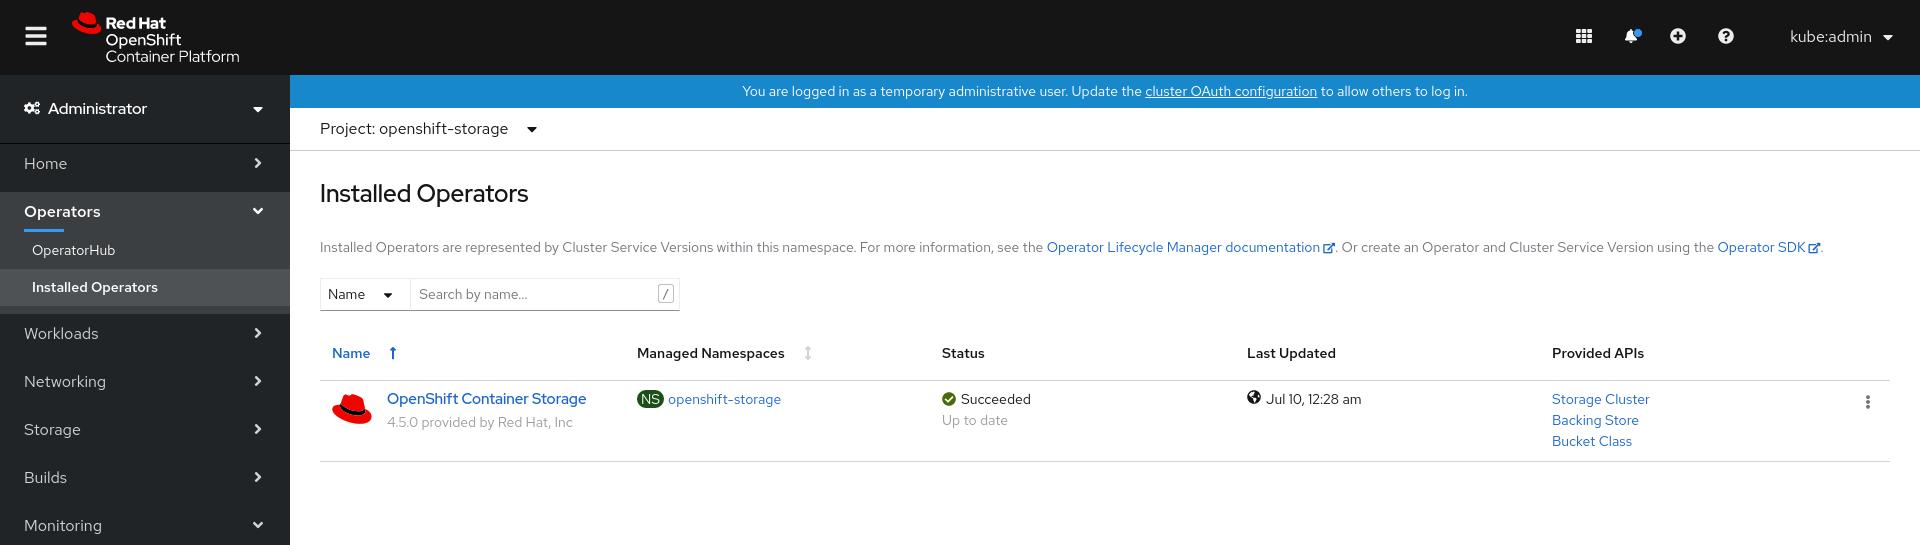 Screenshot of OpenShift Container Storage operator dashboard.